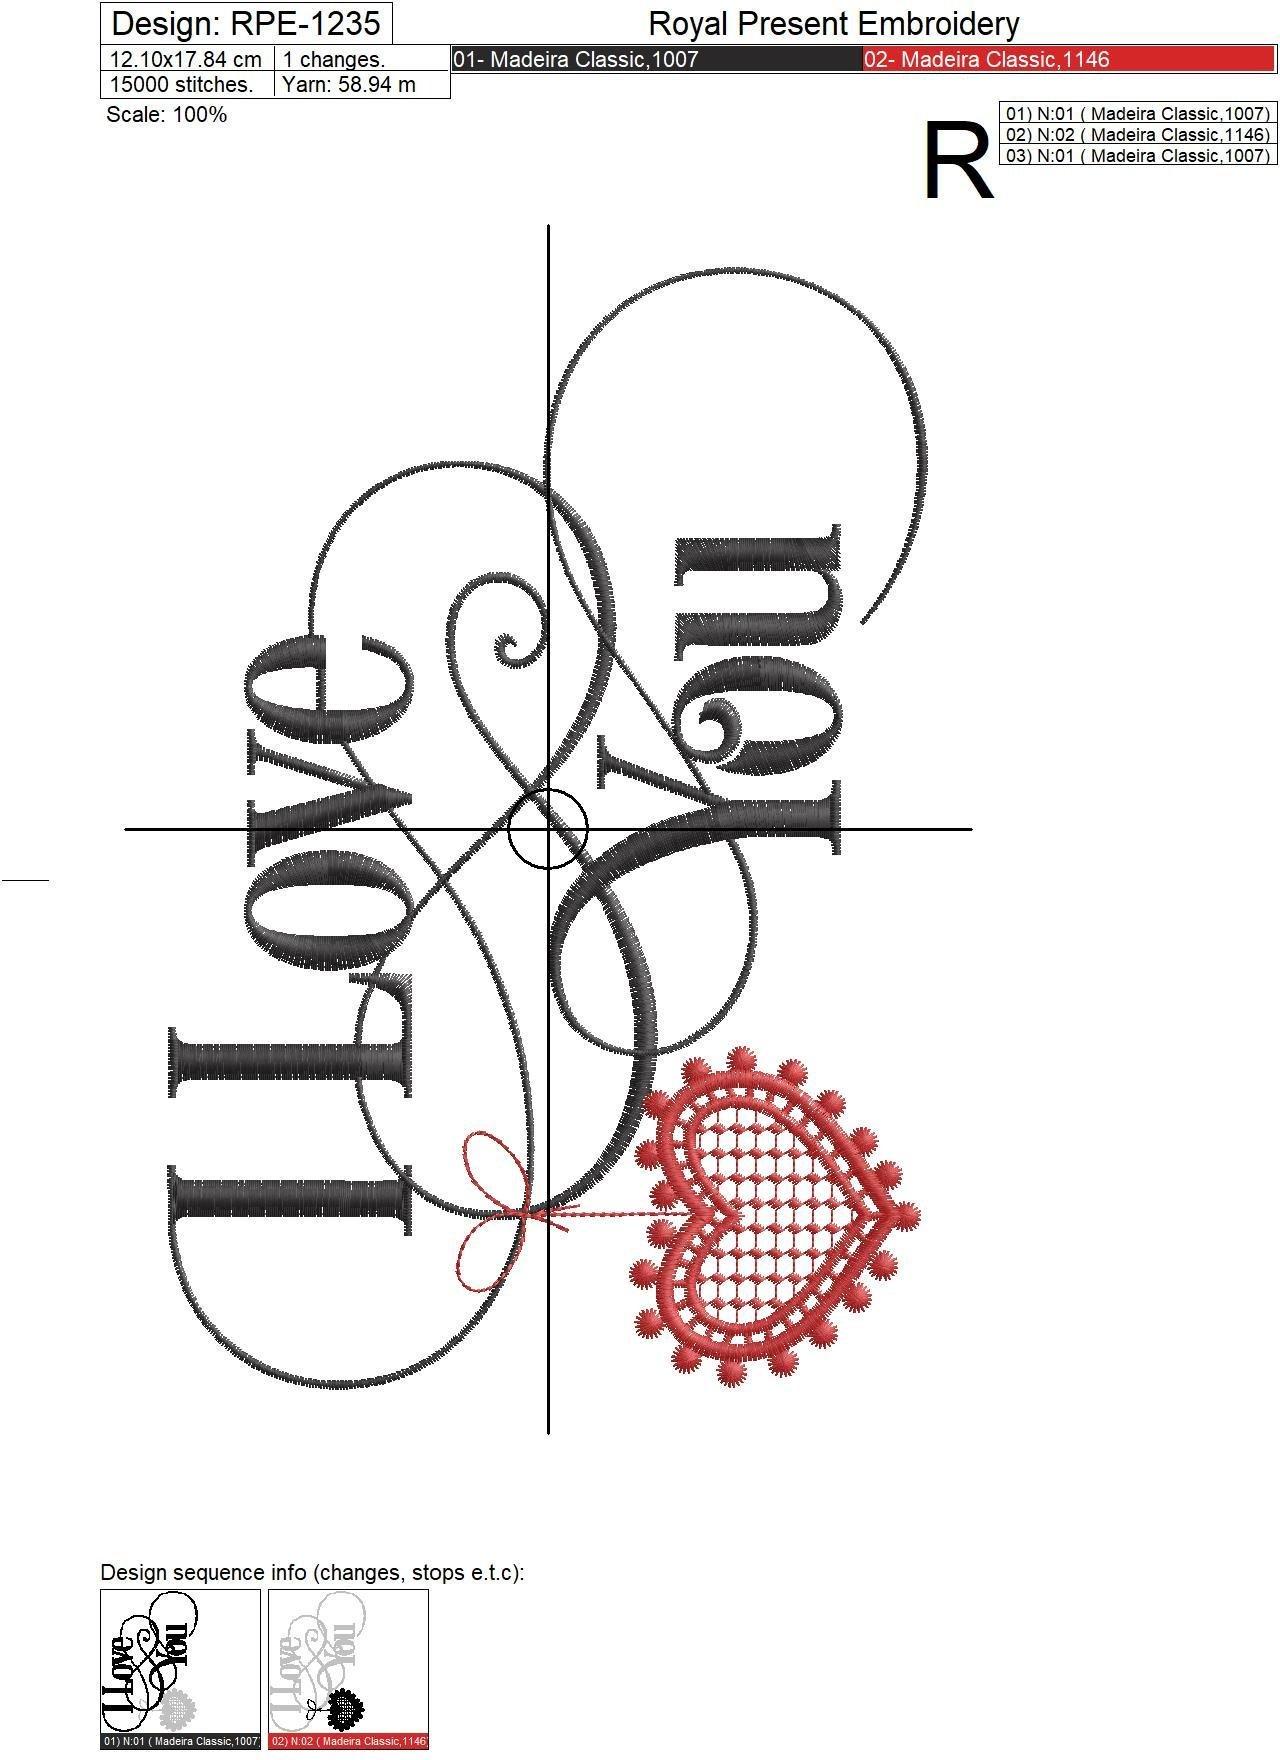 Machine Embroidery Design I Love You inscription - 2 sizes